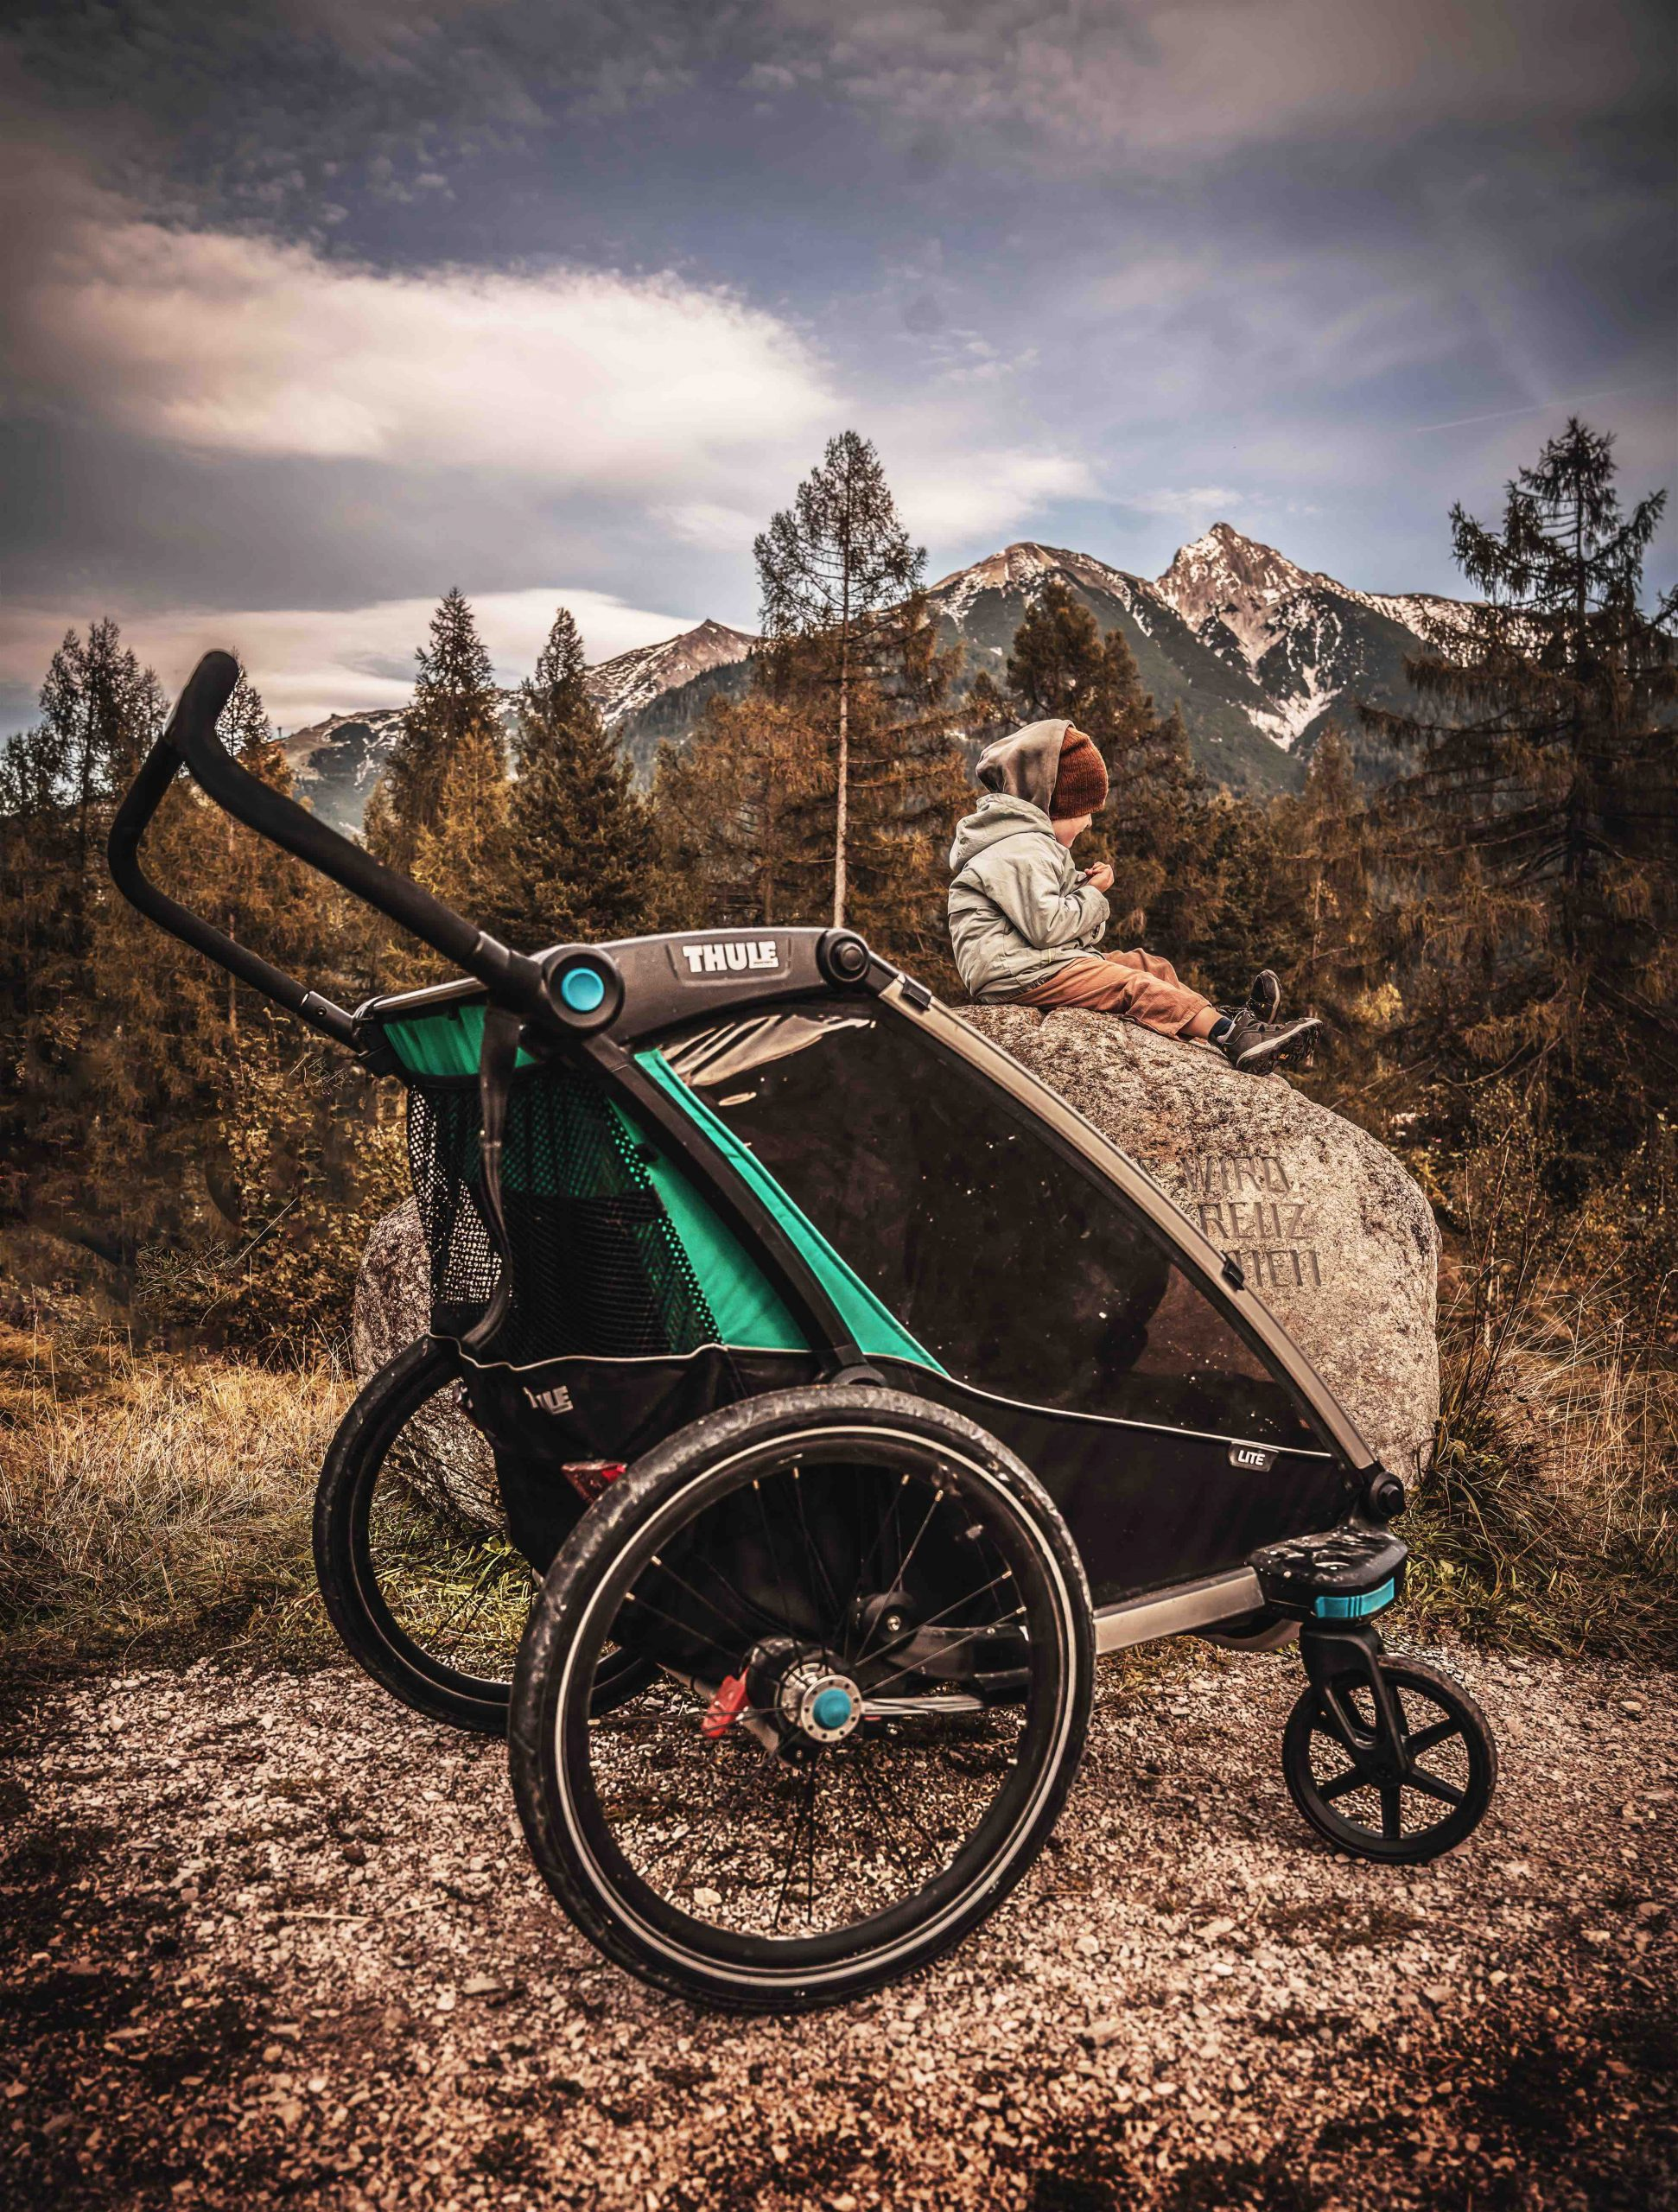 Thule Chariot, Marlenas Fotografie I Dachzeltshop, Innsbruck